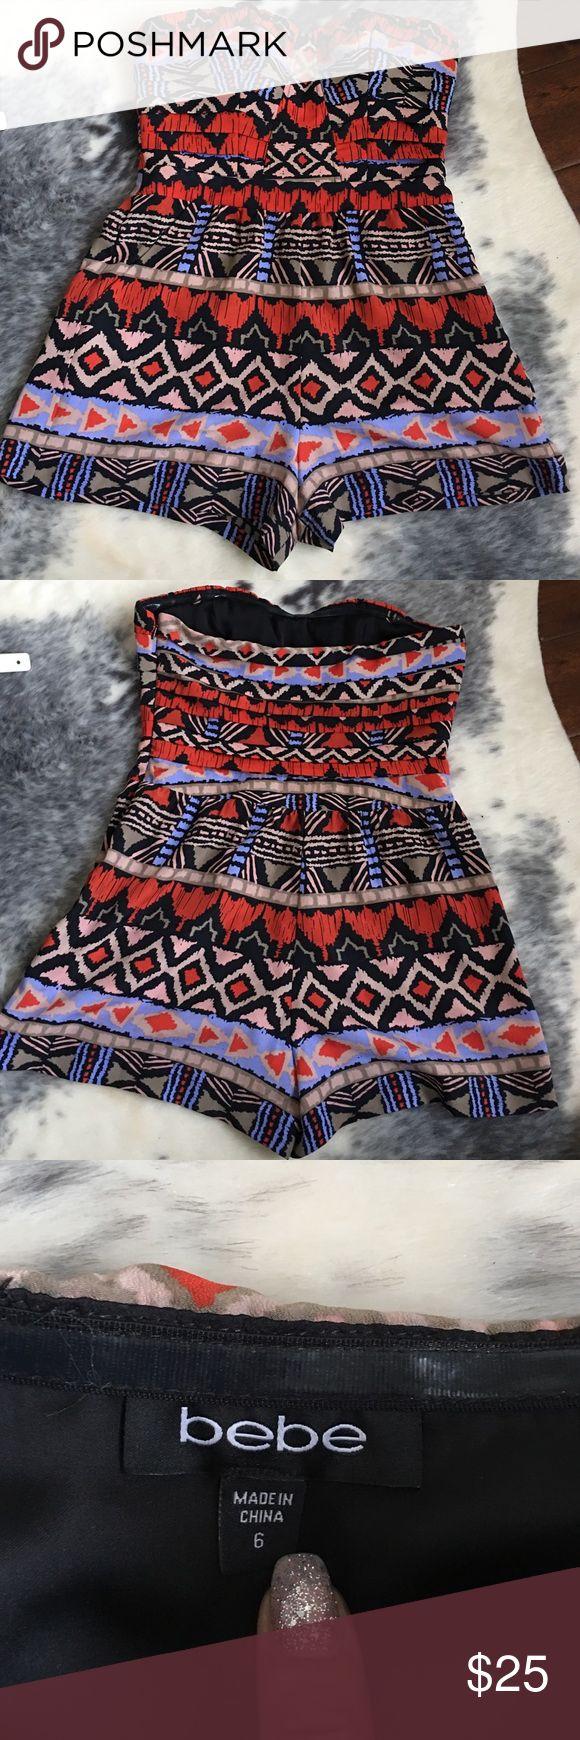 Tribal shorts romper Bebe tribal romper w/shorts 😍 bebe Other